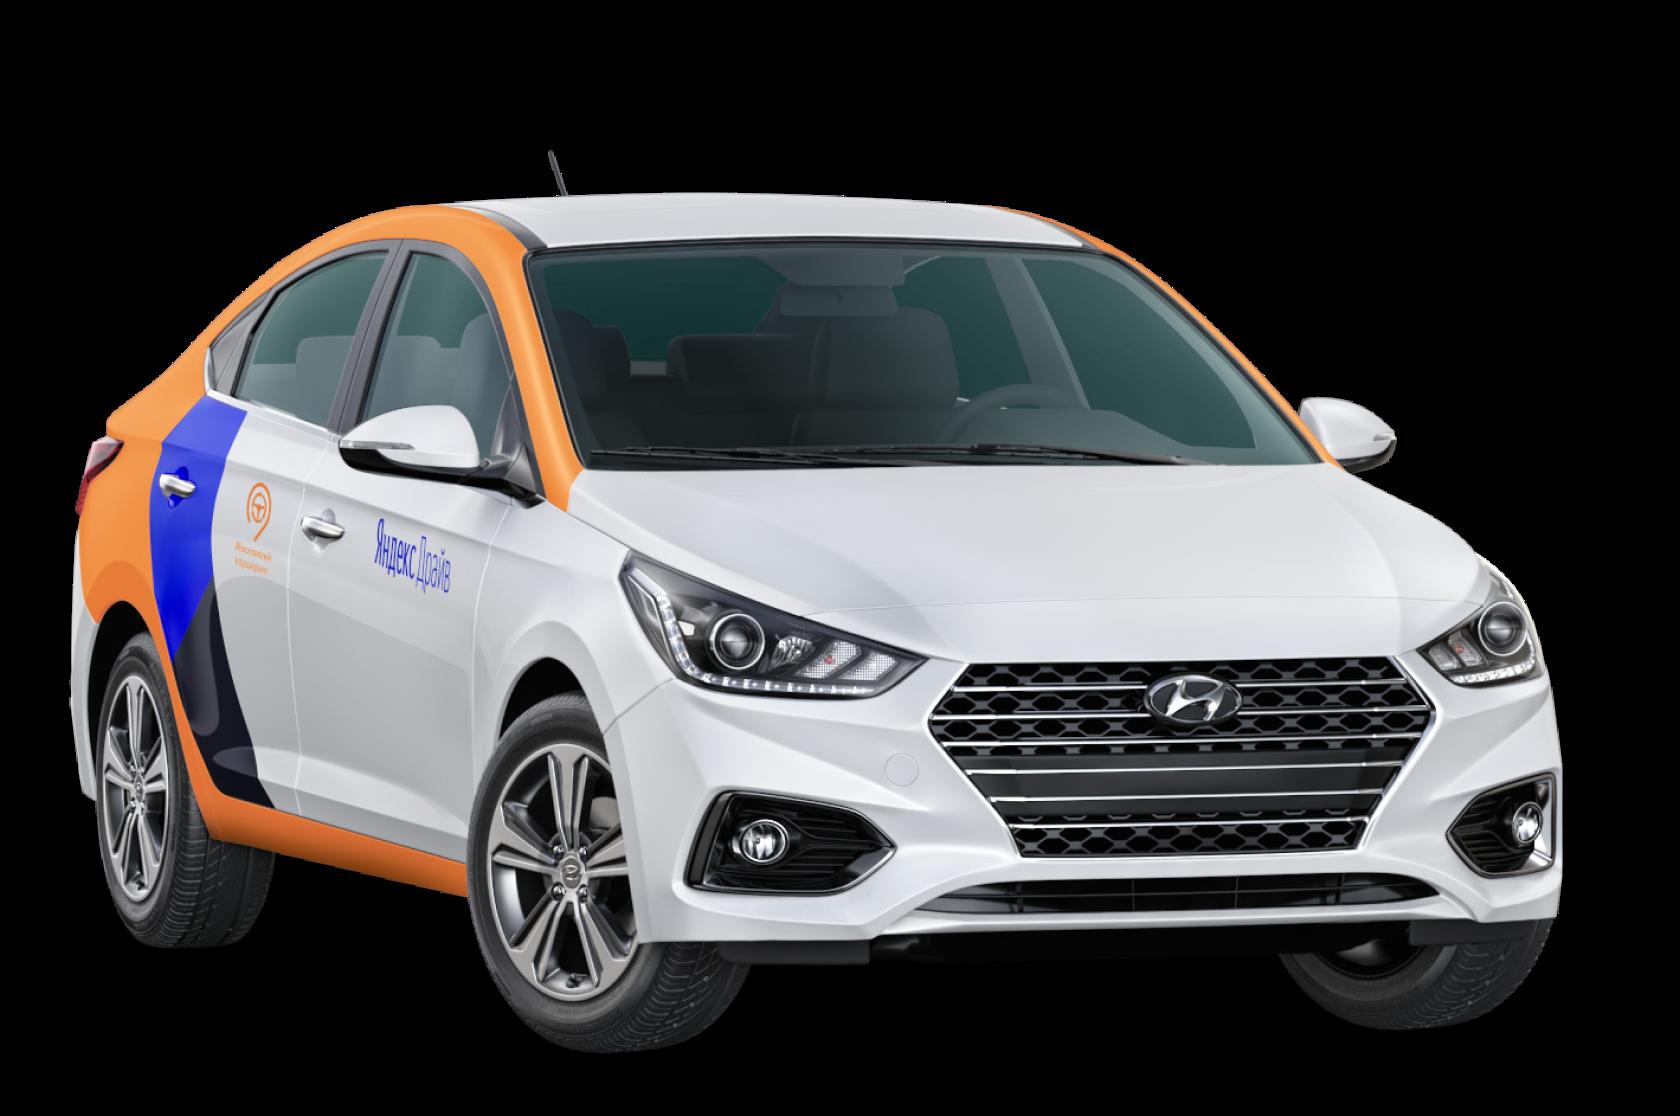 Hyundai<br>Solaris